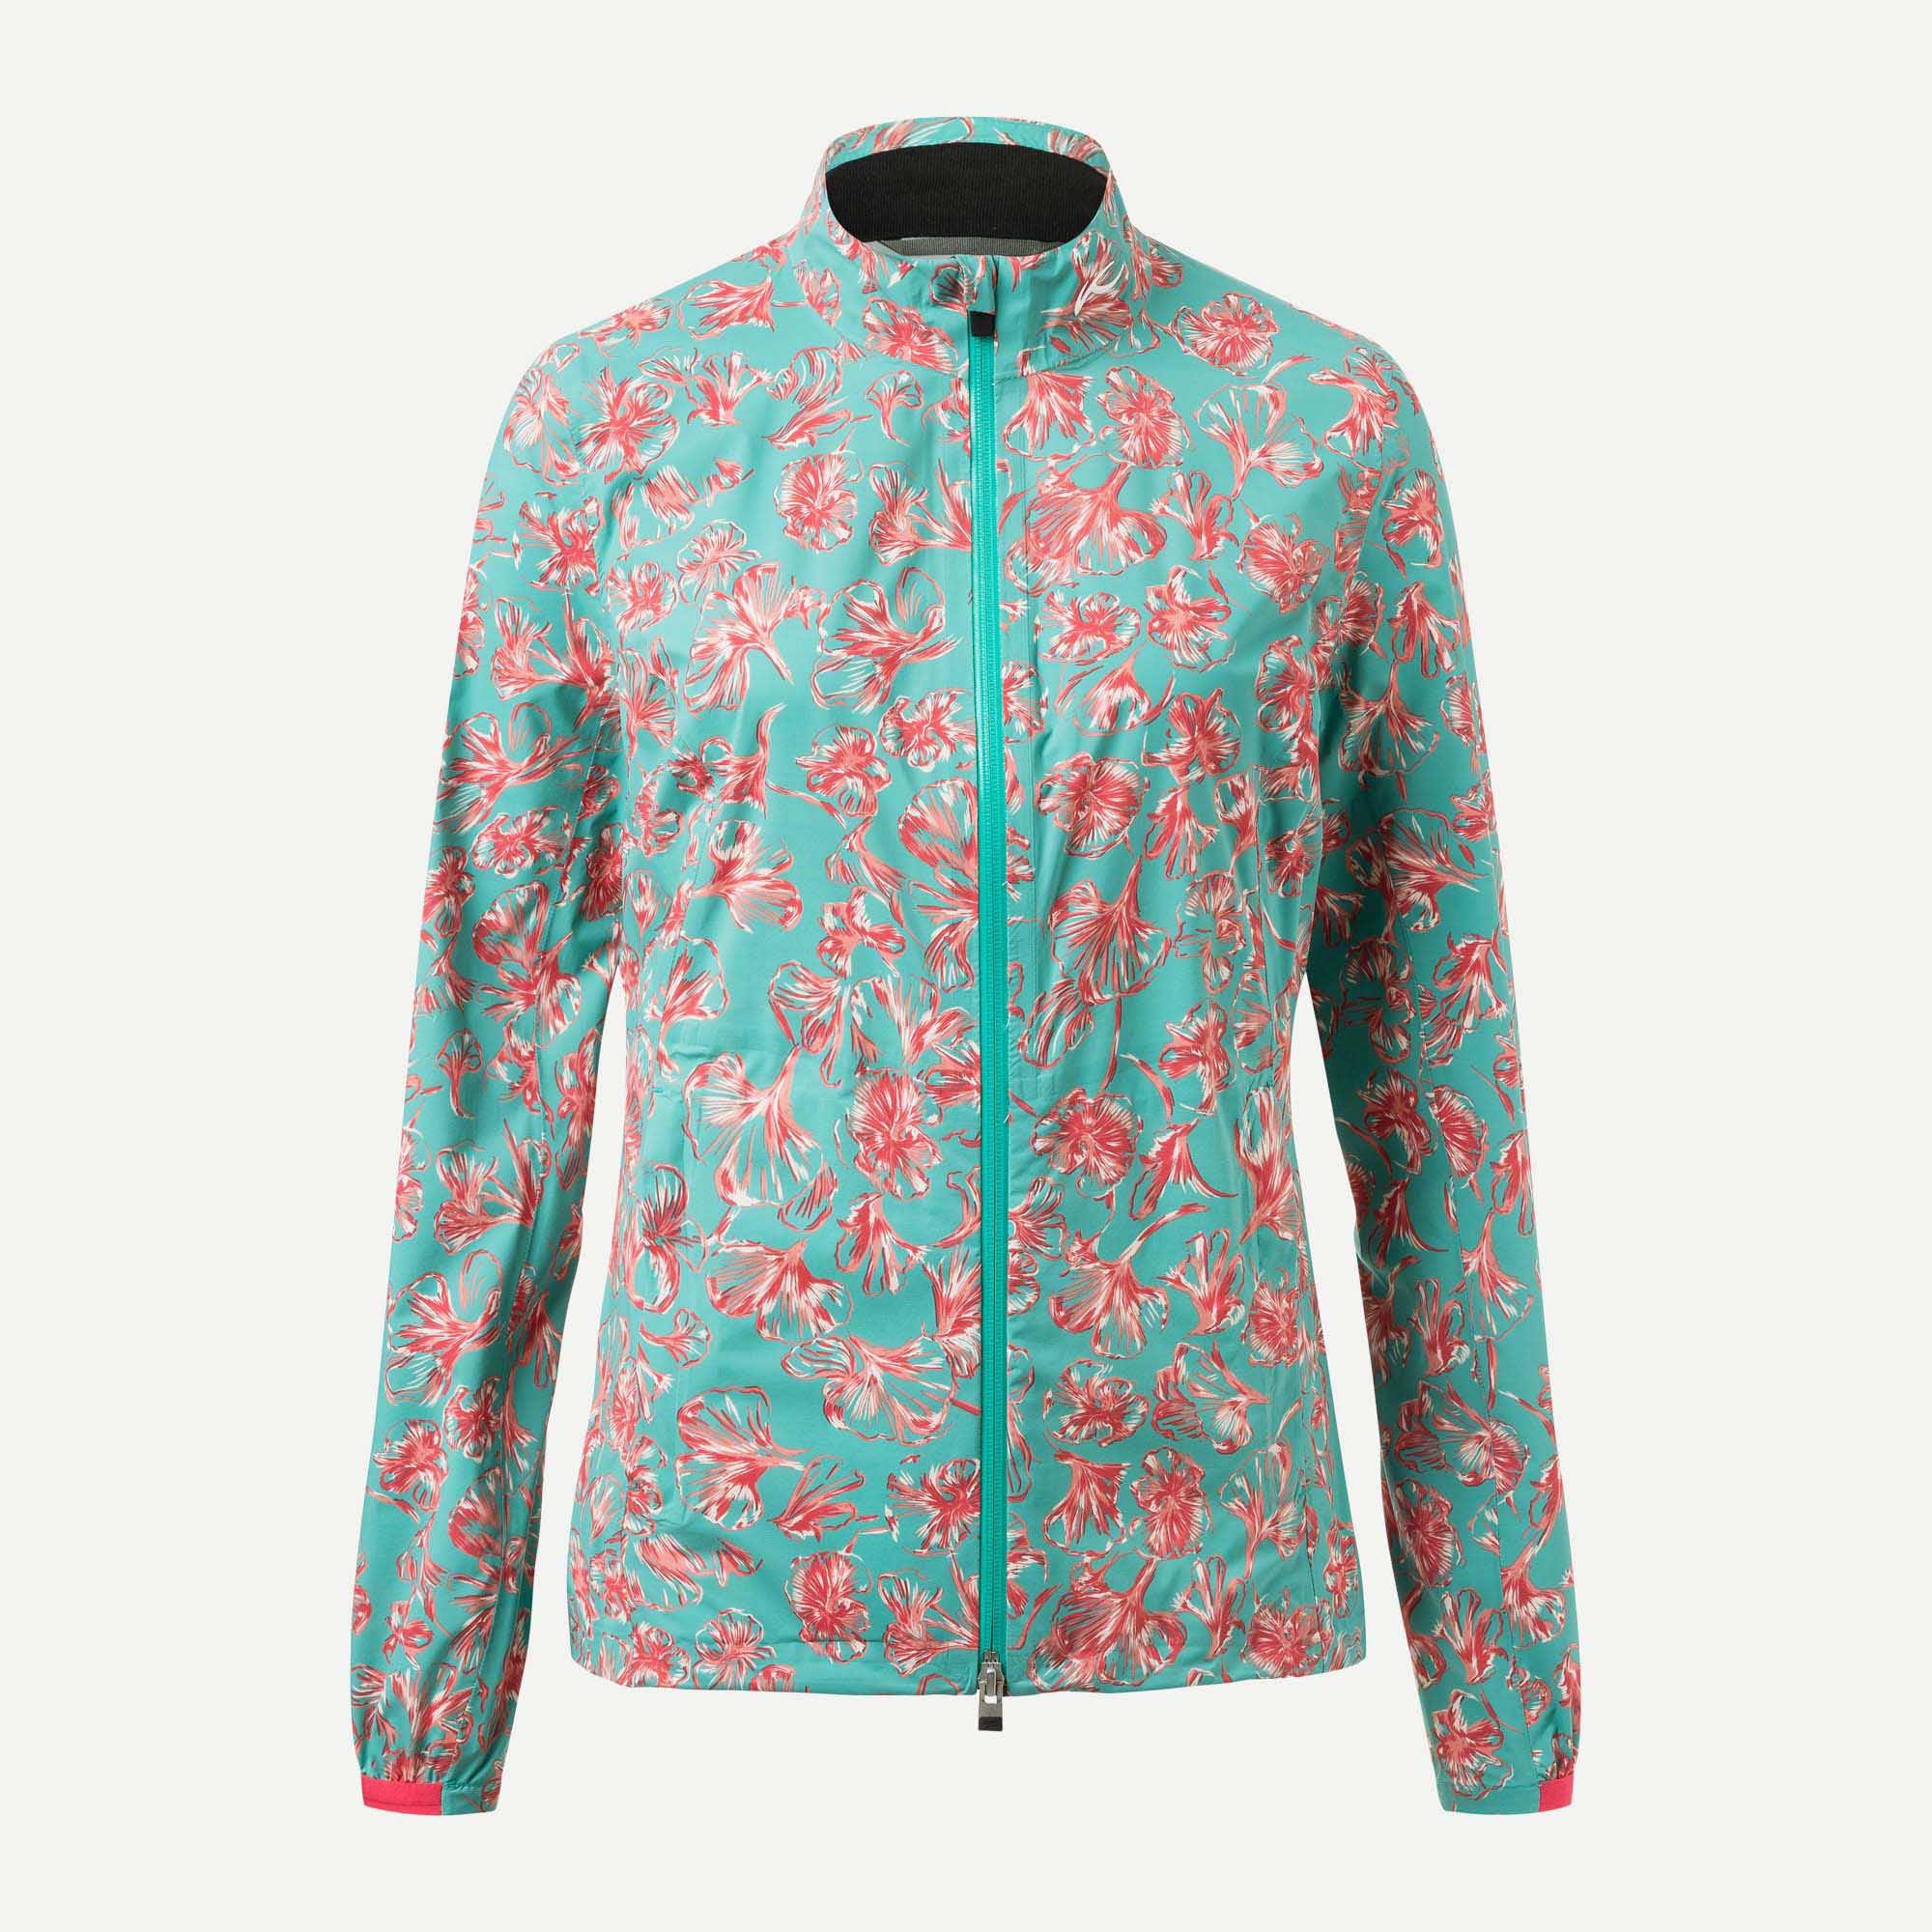 5L Women's Jacket Printed 2 Dextra LGjSzqMVUp